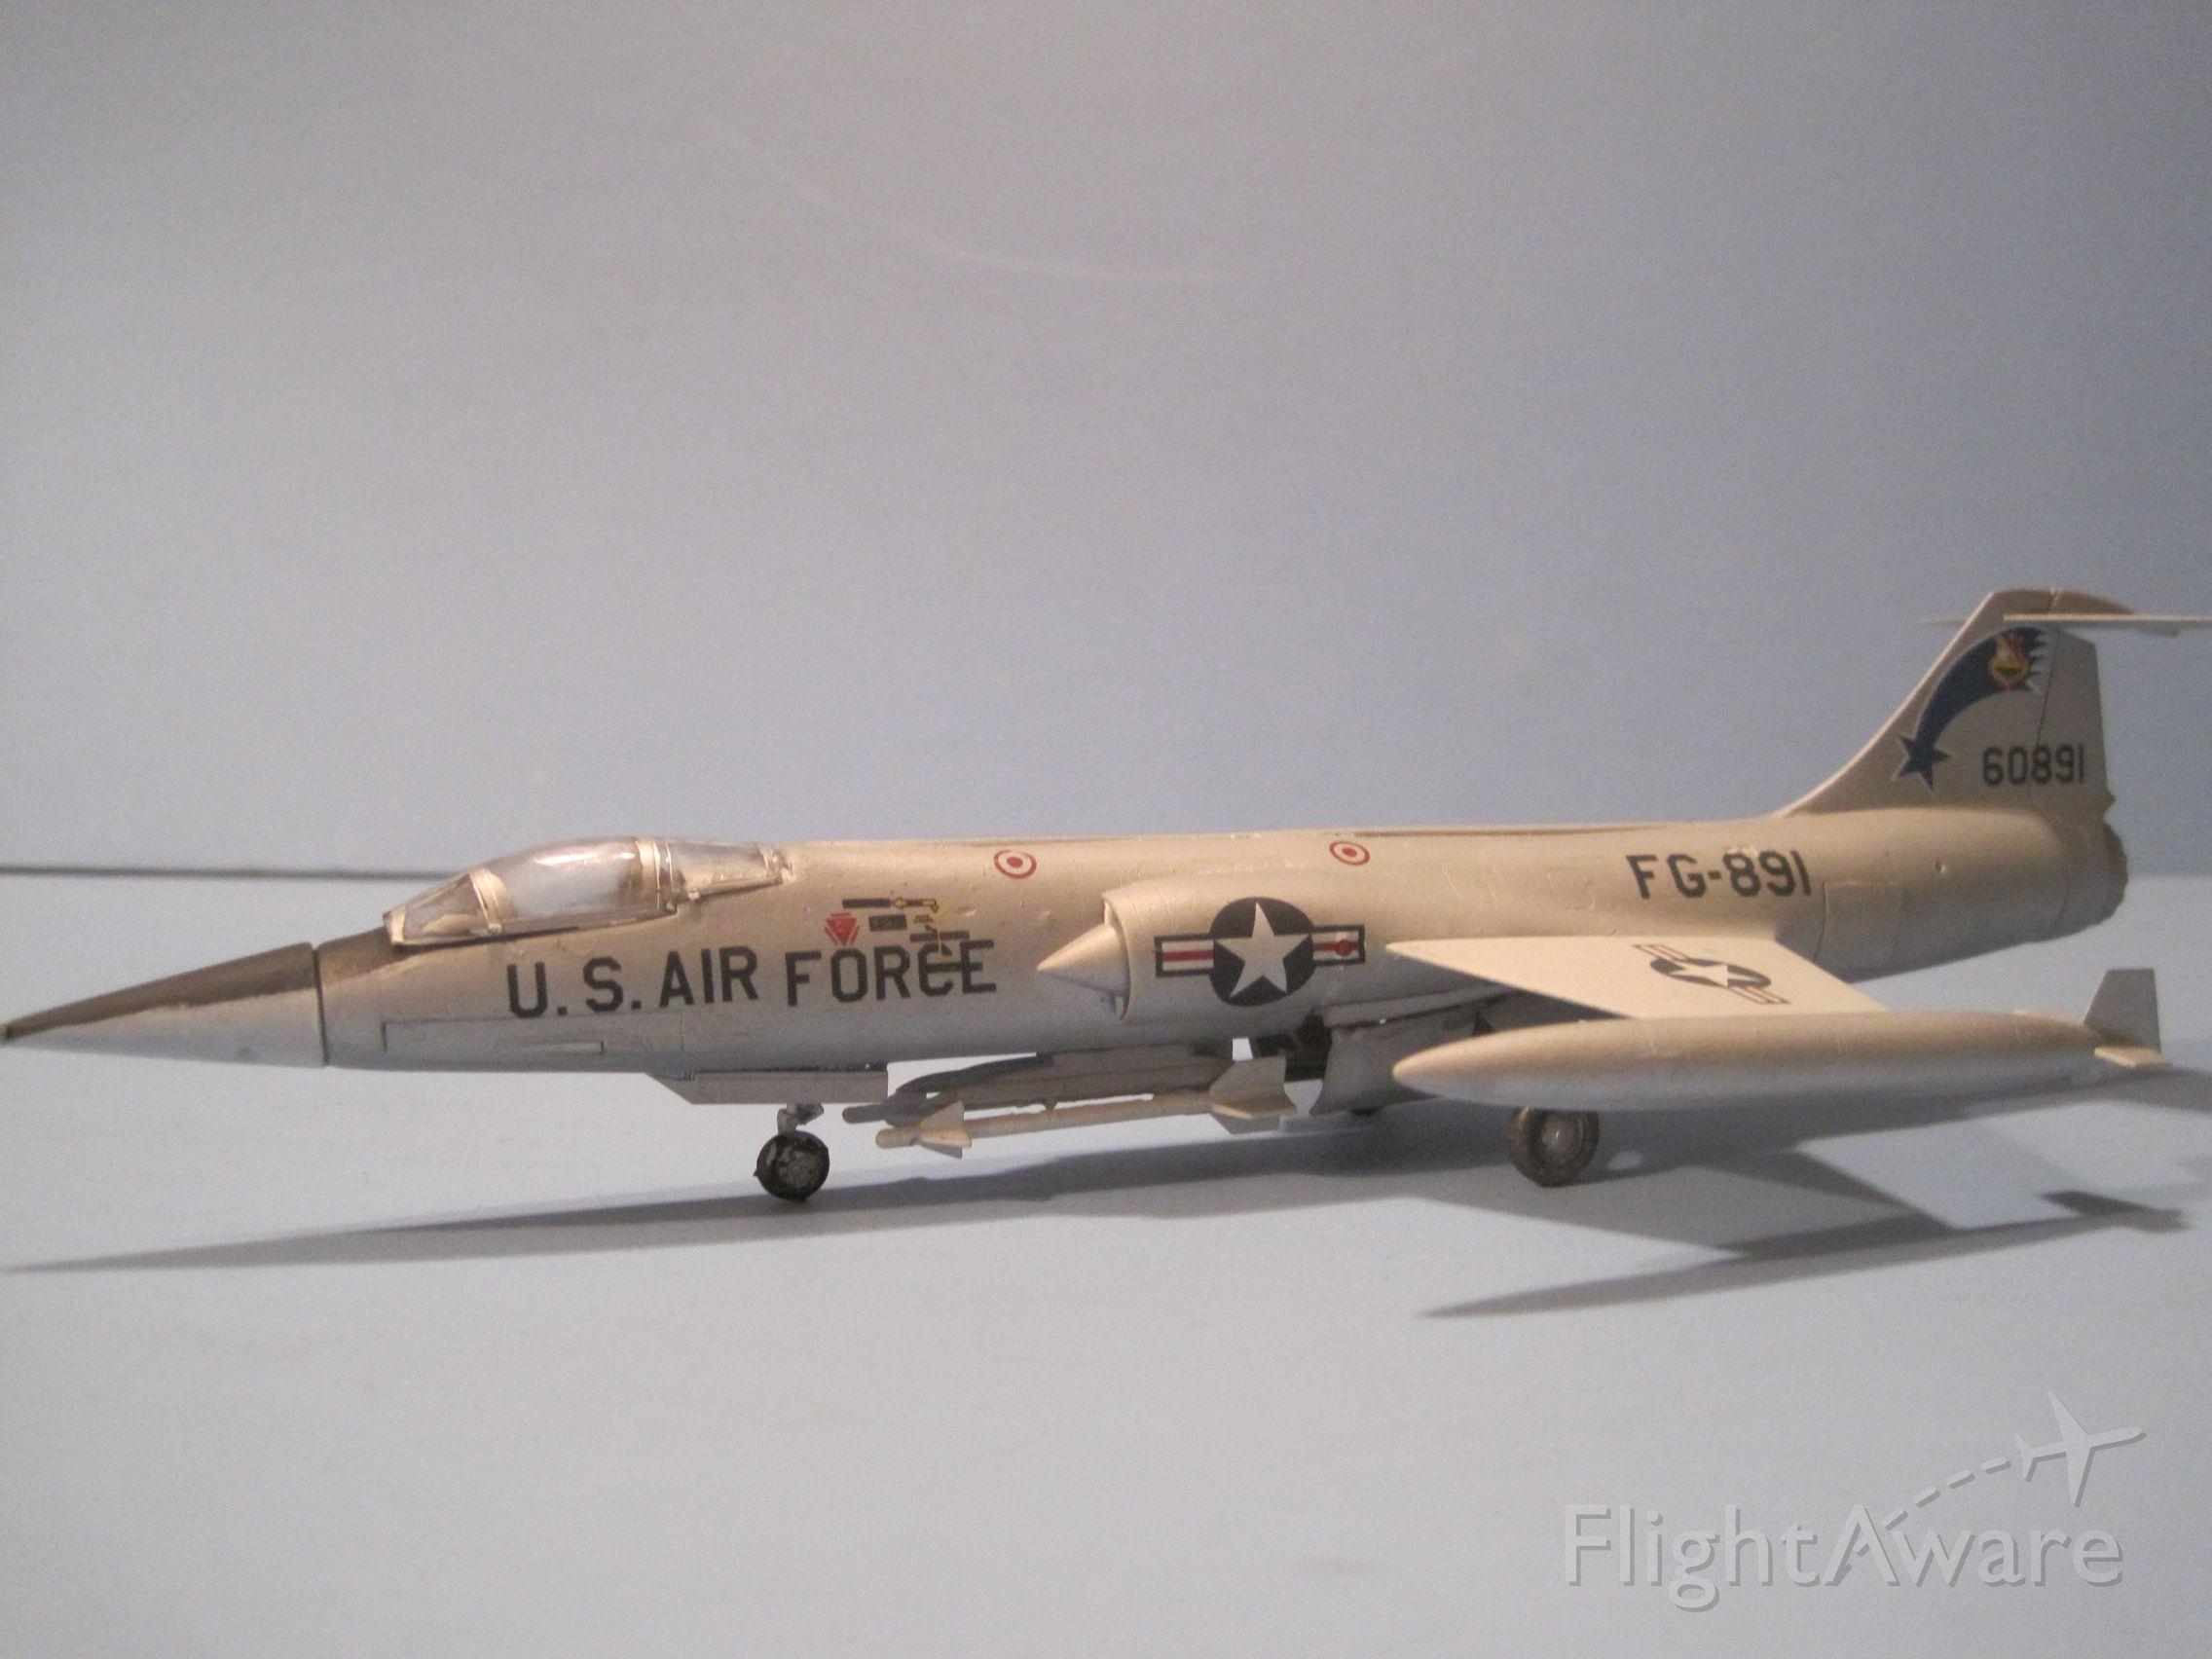 — — - Lockheed F-104C Starfighter model in 1/72 scale.